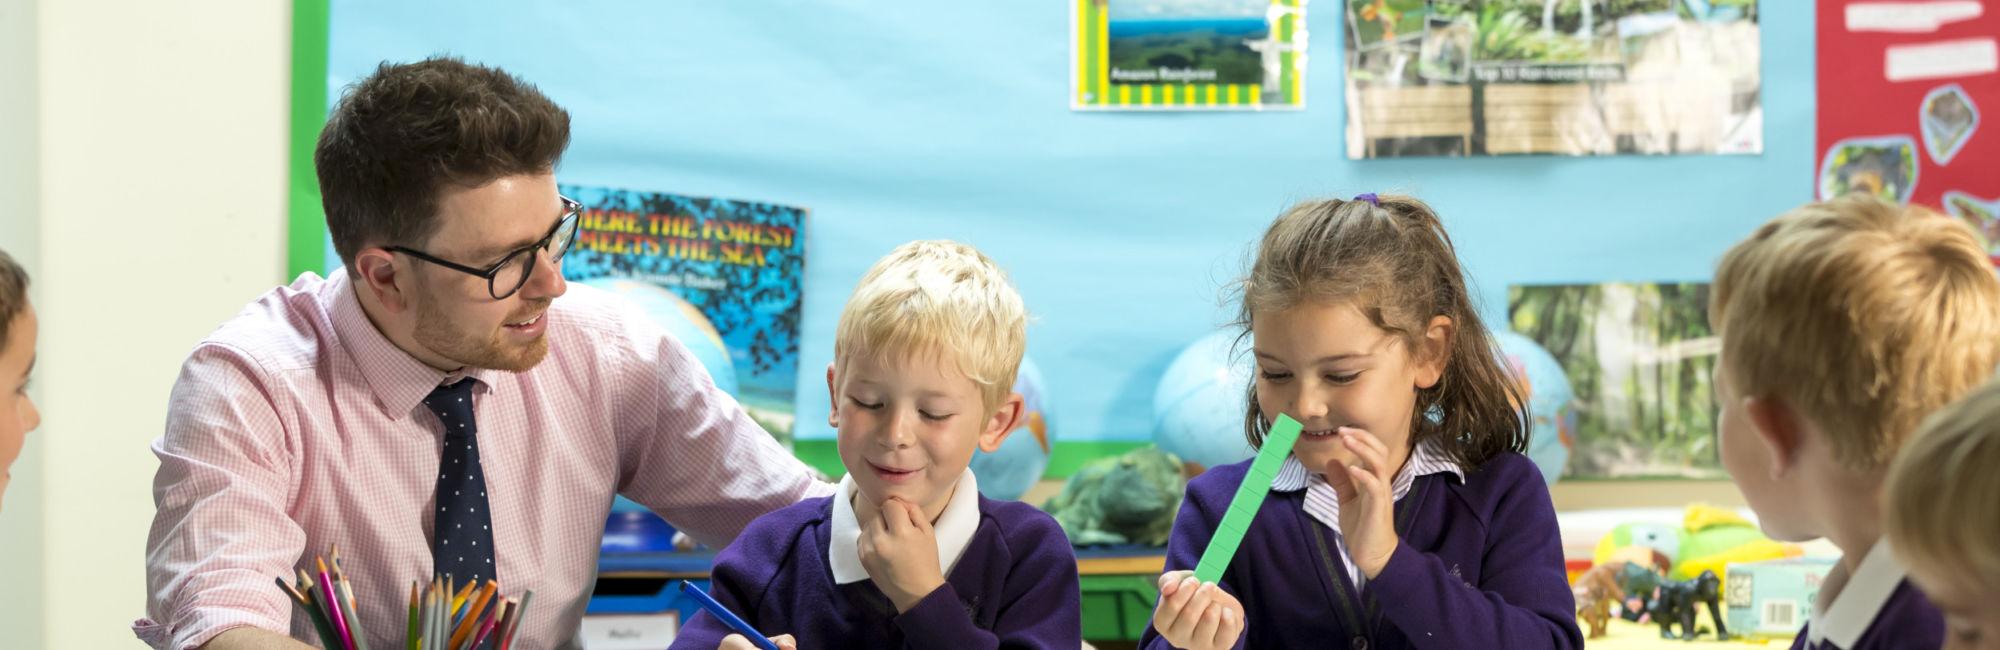 wycliffe nursery kids and teacher learning in class